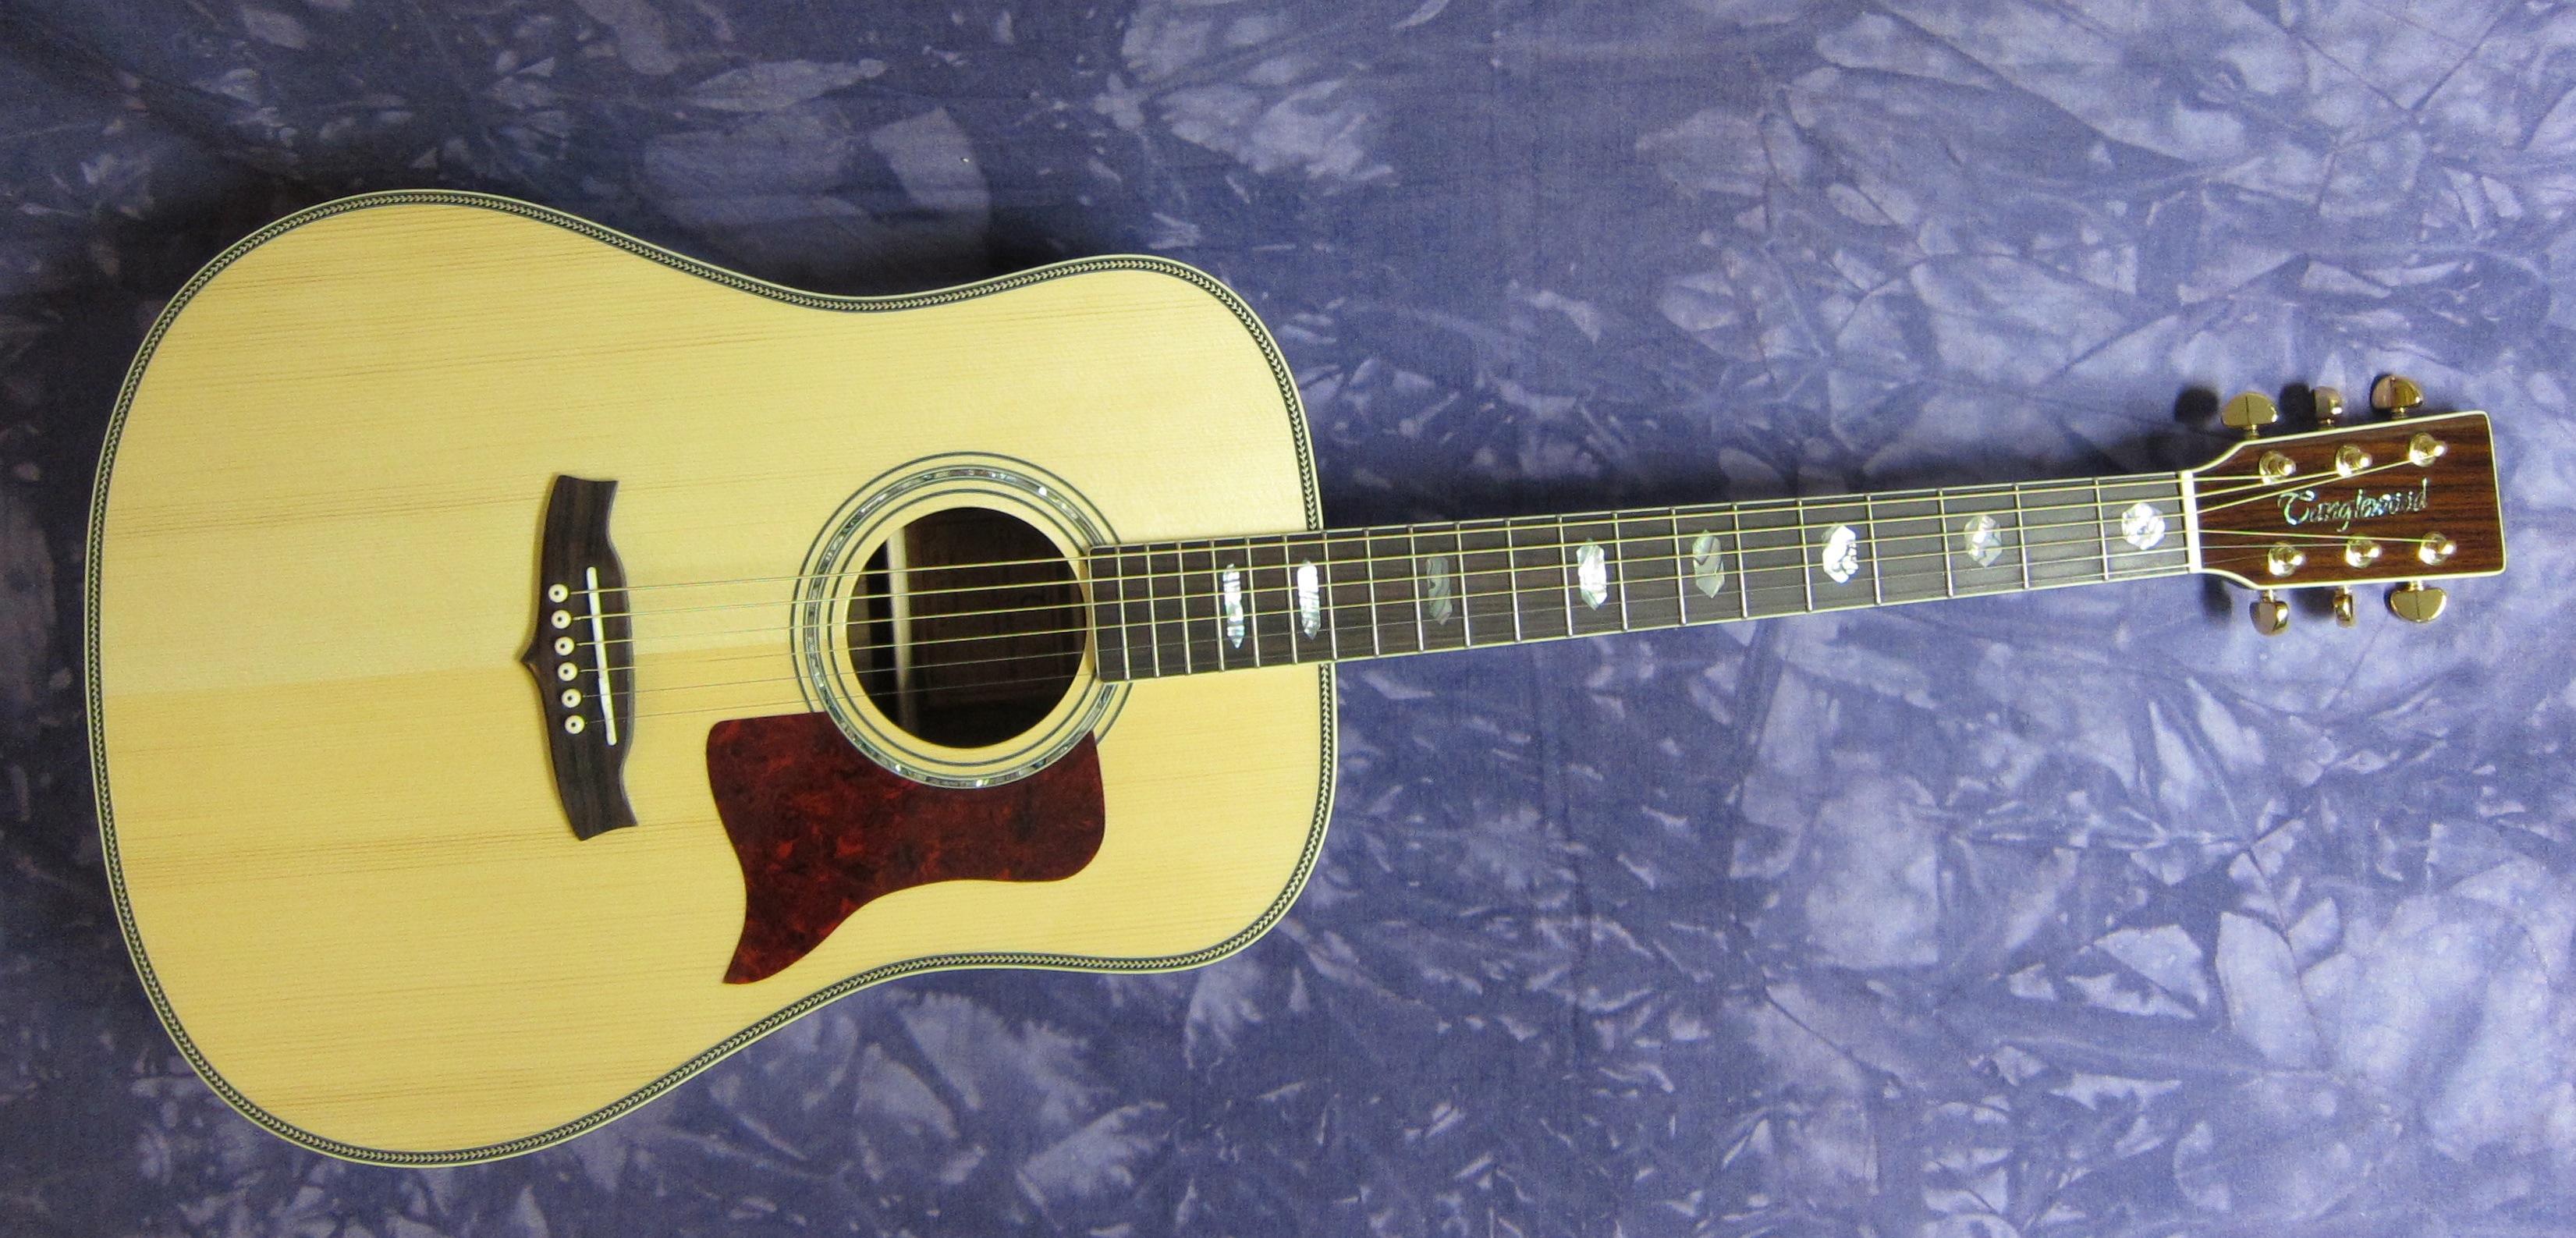 Review tanglewood tw1000n english summary kitarablogi for The tanglewood